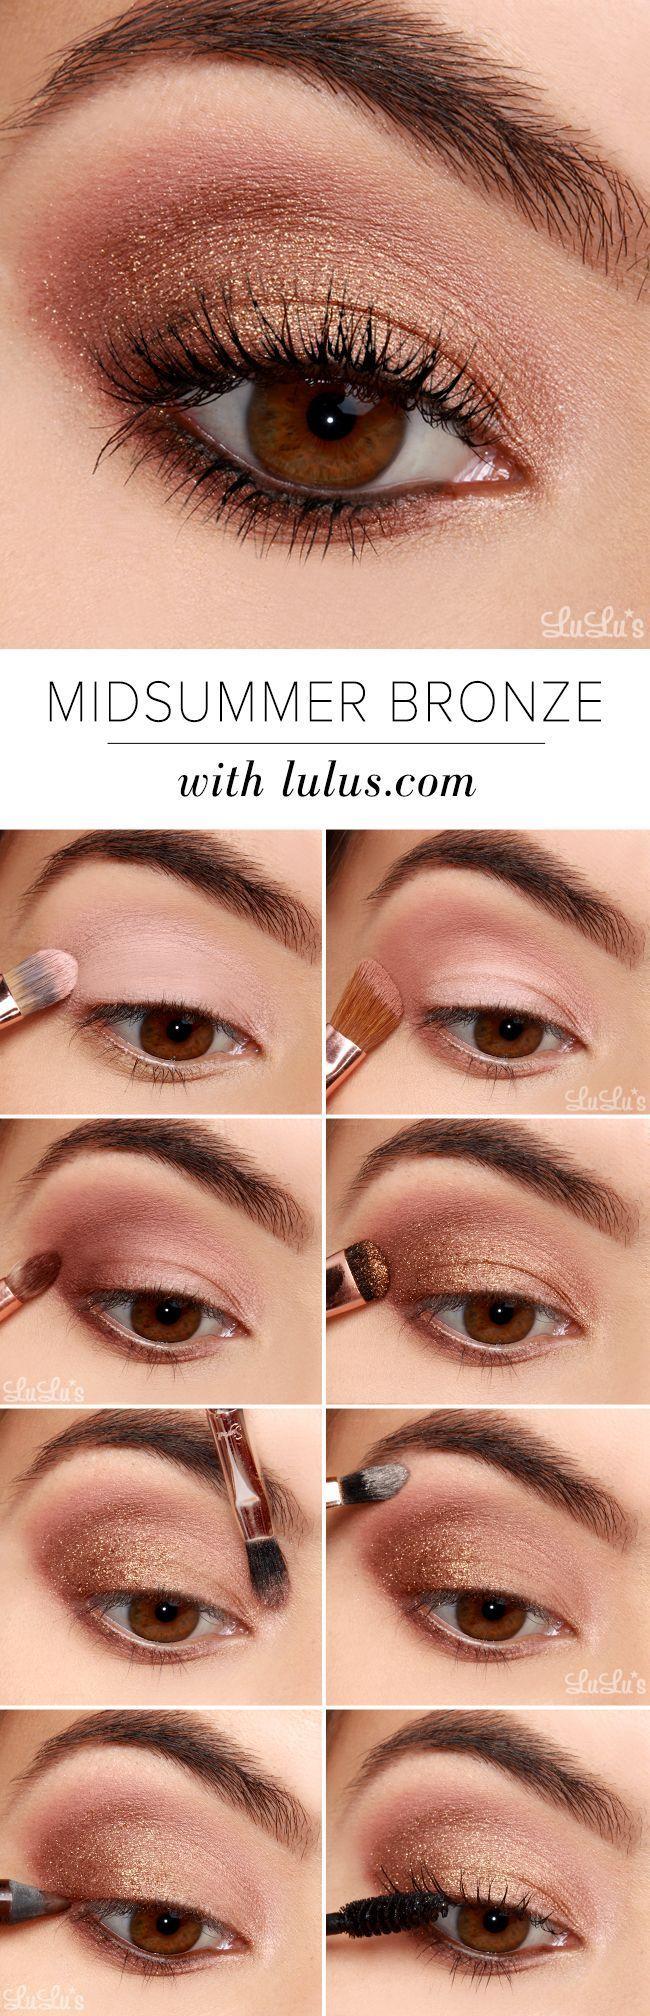 Lulus Howto: Midsummer Bronze Eyeshadow Tutorial With Sigma!